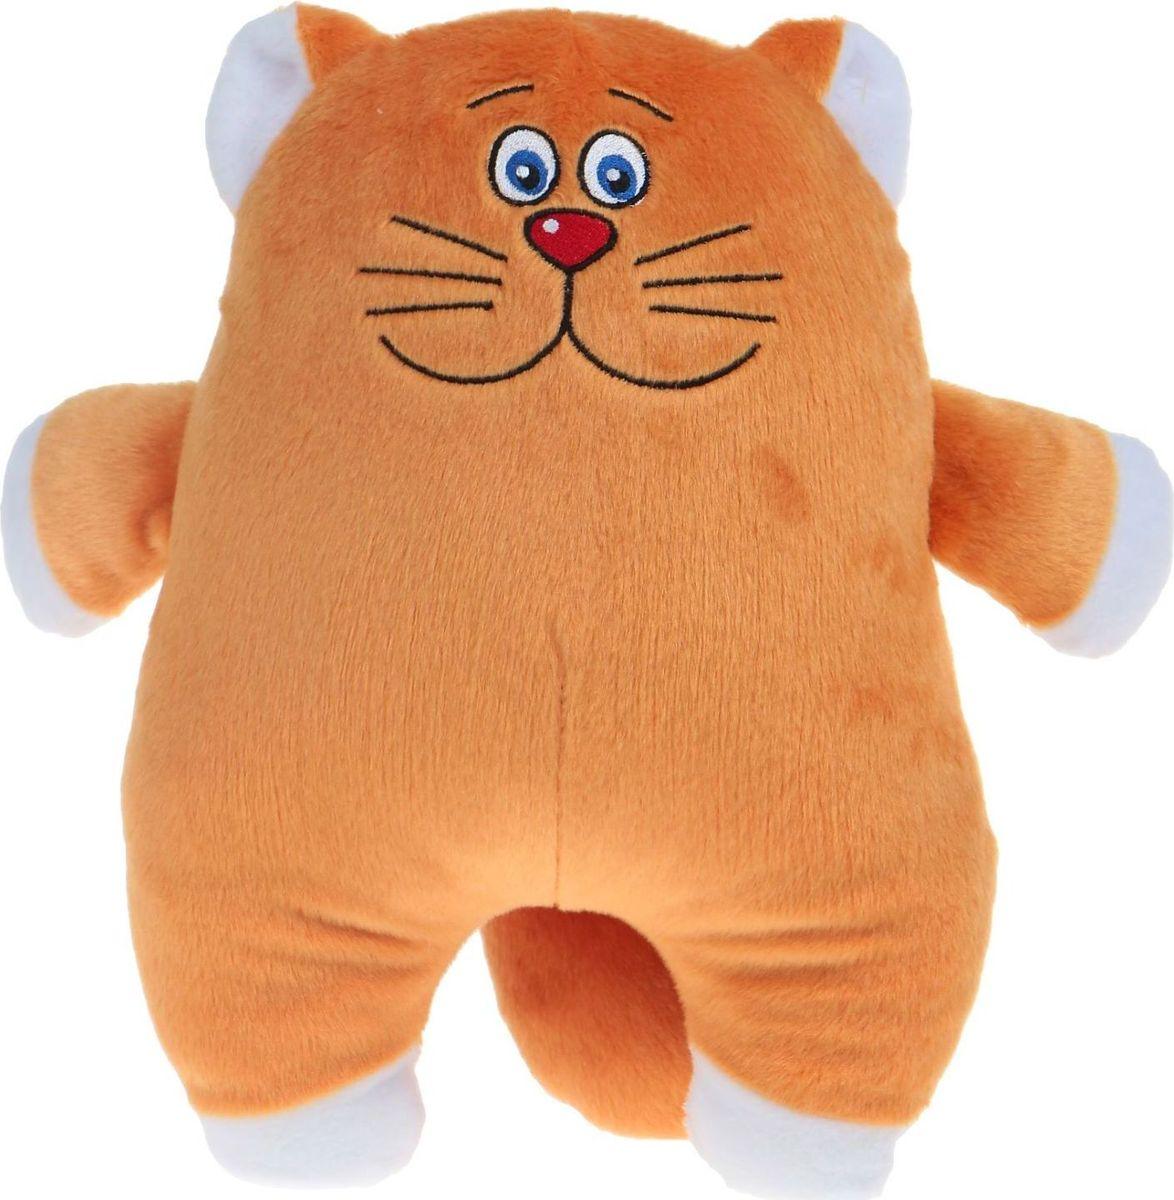 Sima-land Мягкая игрушка Кот Веня 40 см sima land мягкая игрушка собака хаски 40 см